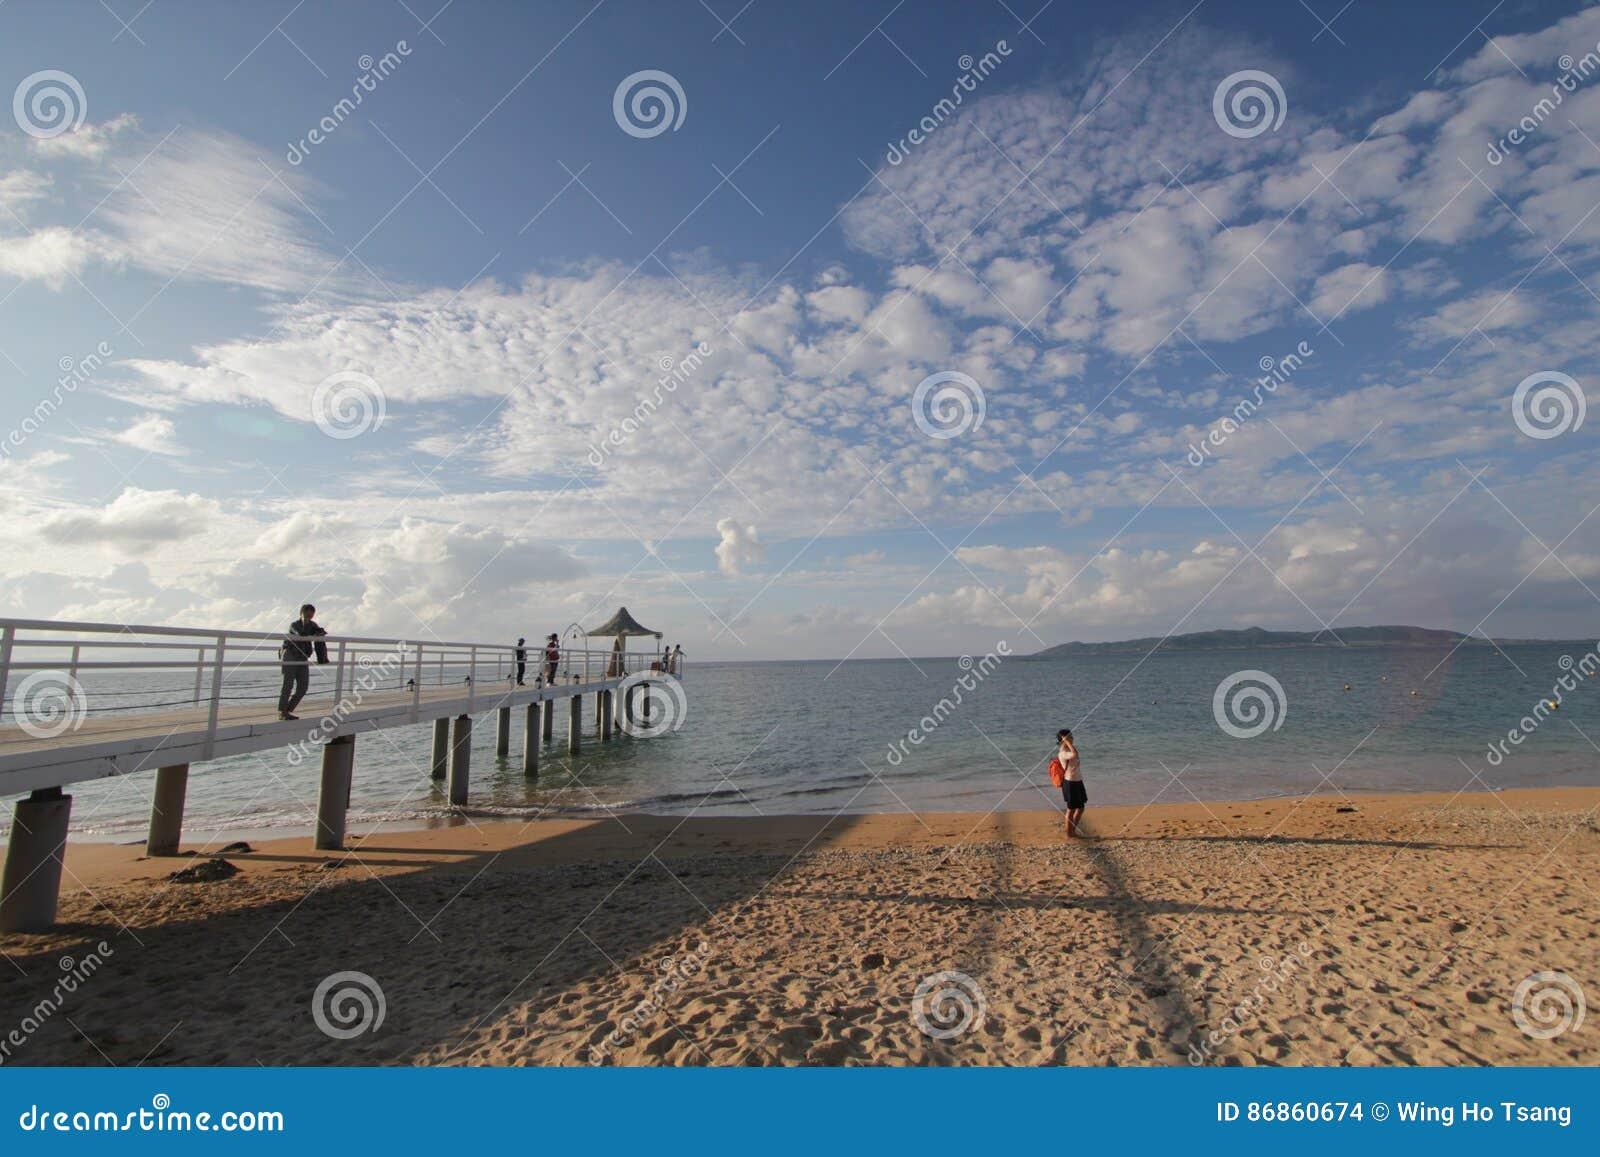 Sea, sky, cloud, beach, horizon, body, of, water, ocean, pier, shore, coast, sand, coastal, and, oceanic, landforms, vacation, wav